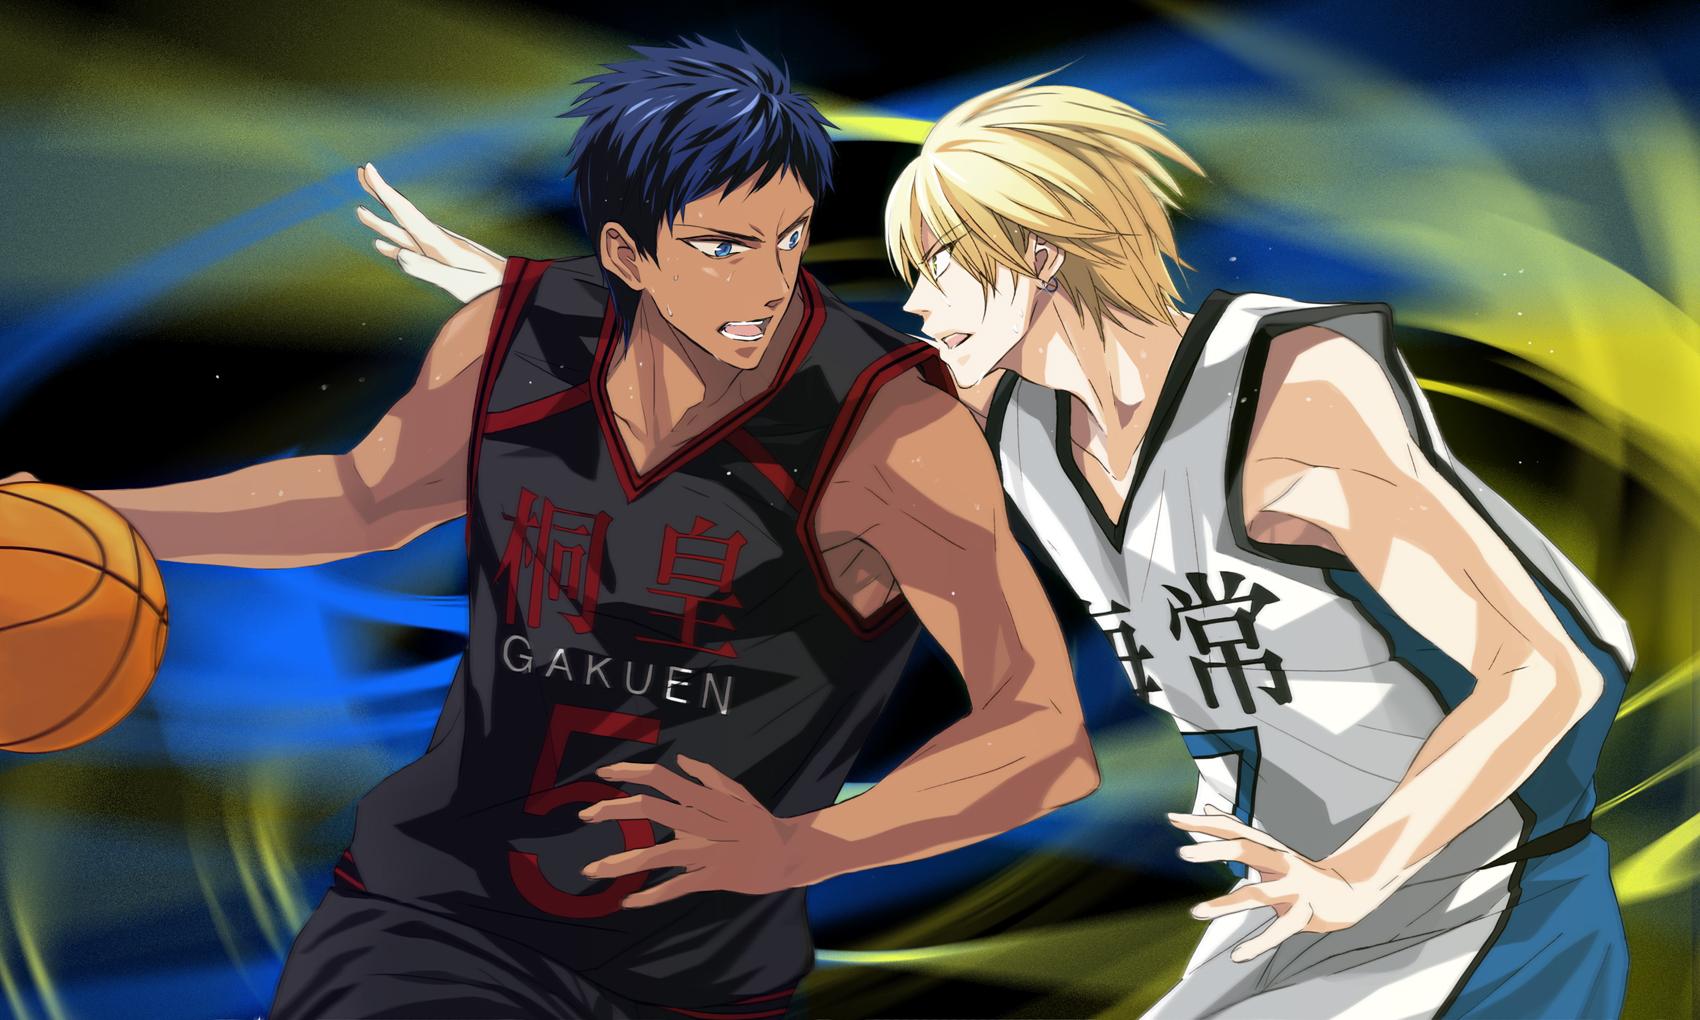 the gallery for gt kuroko no basket kise vs aomine